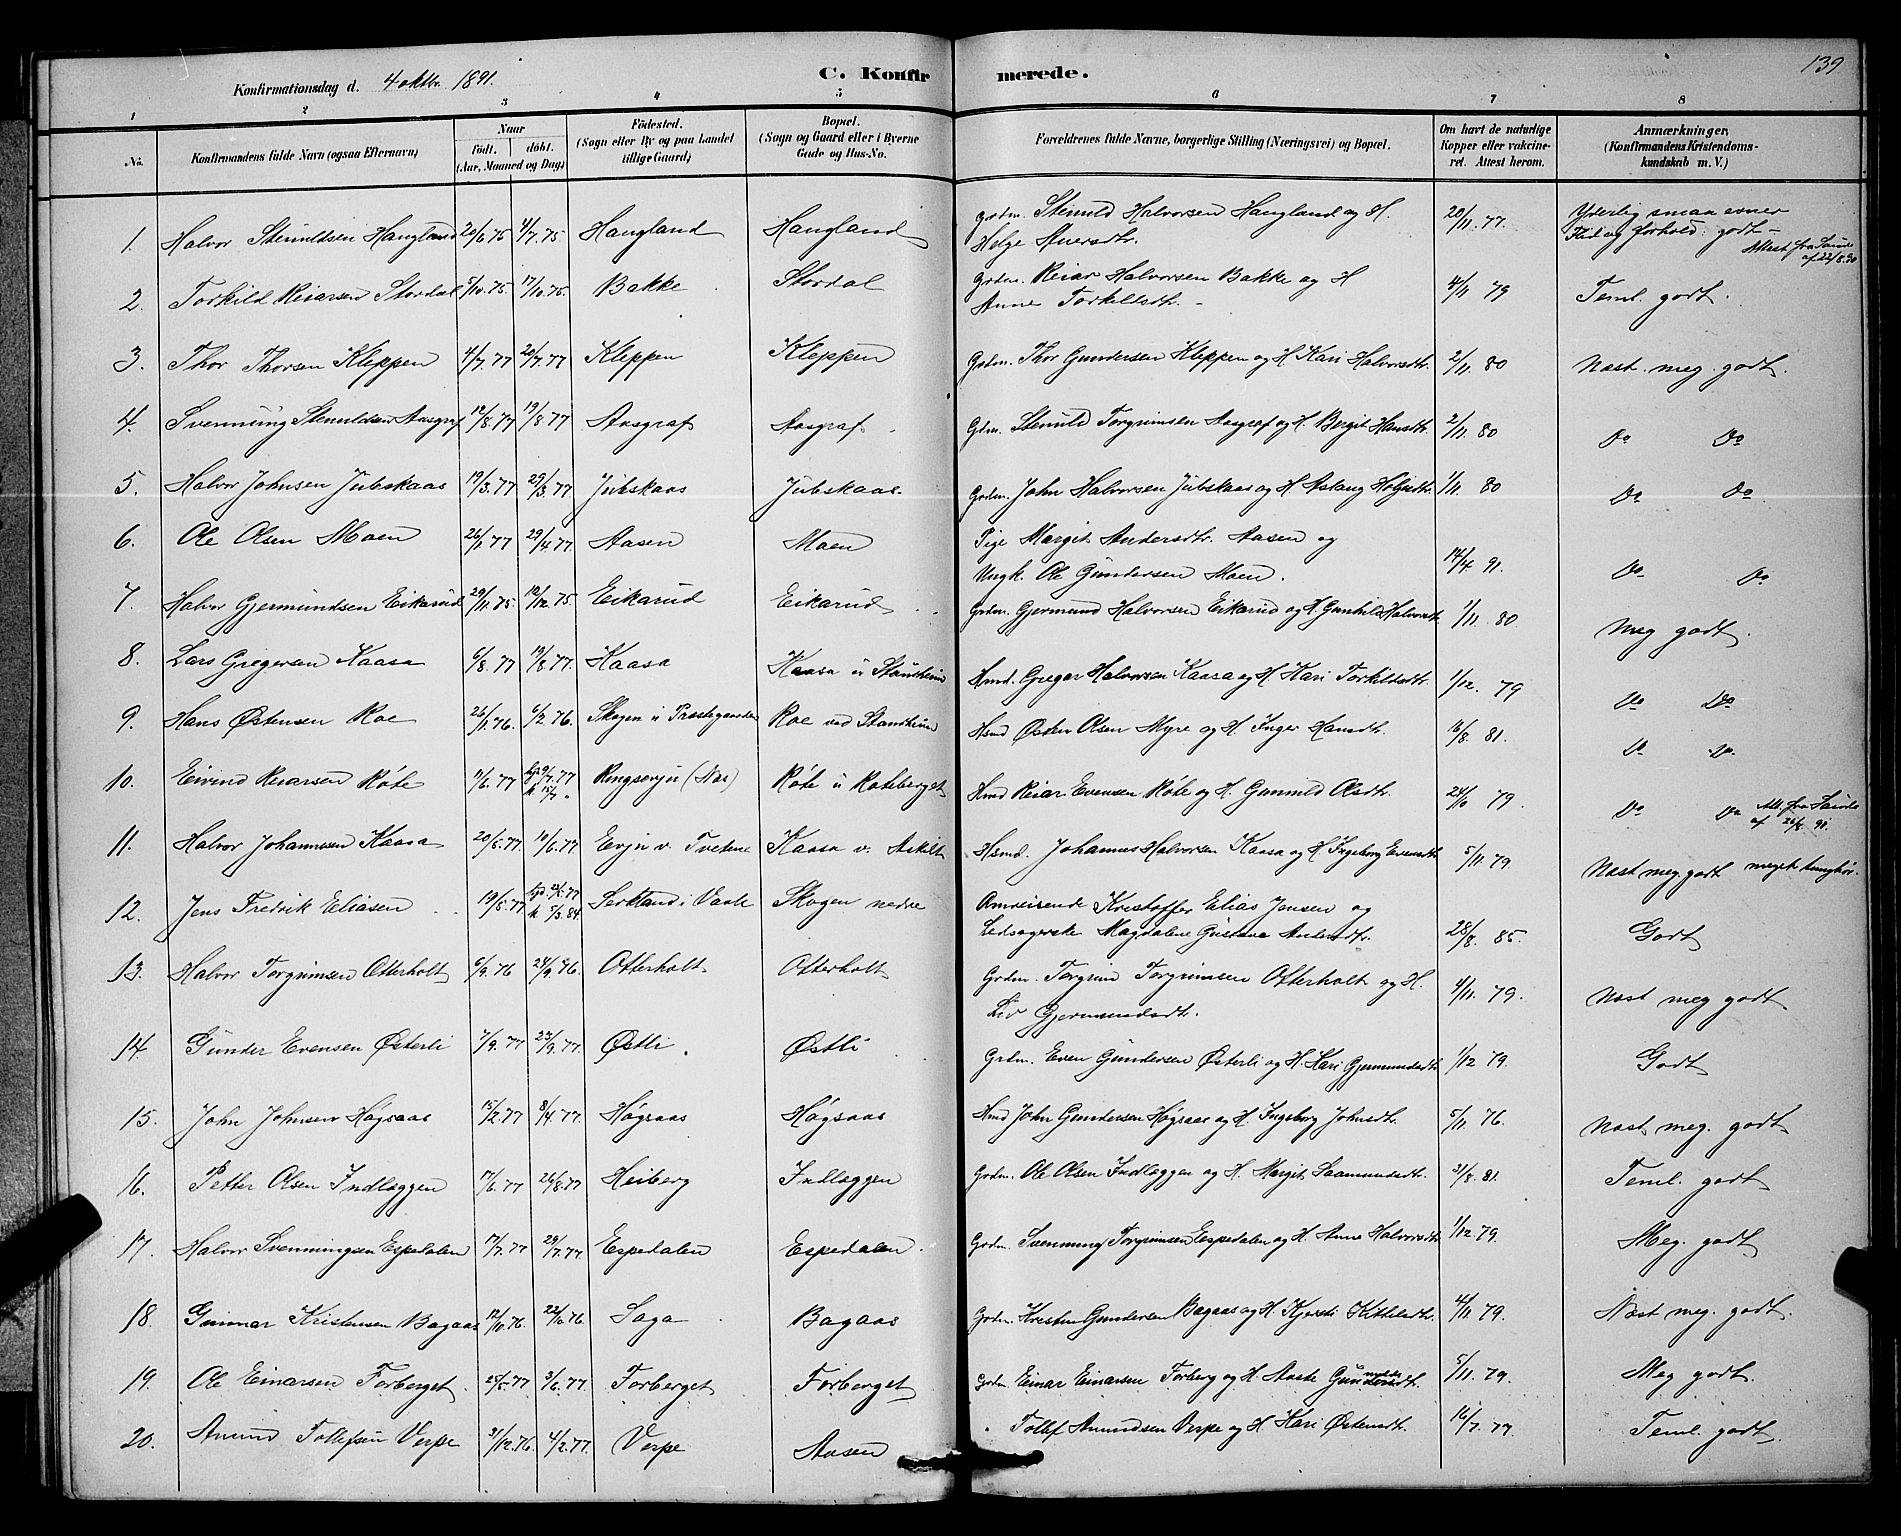 SAKO, Bø kirkebøker, G/Ga/L0005: Klokkerbok nr. 5, 1883-1897, s. 139